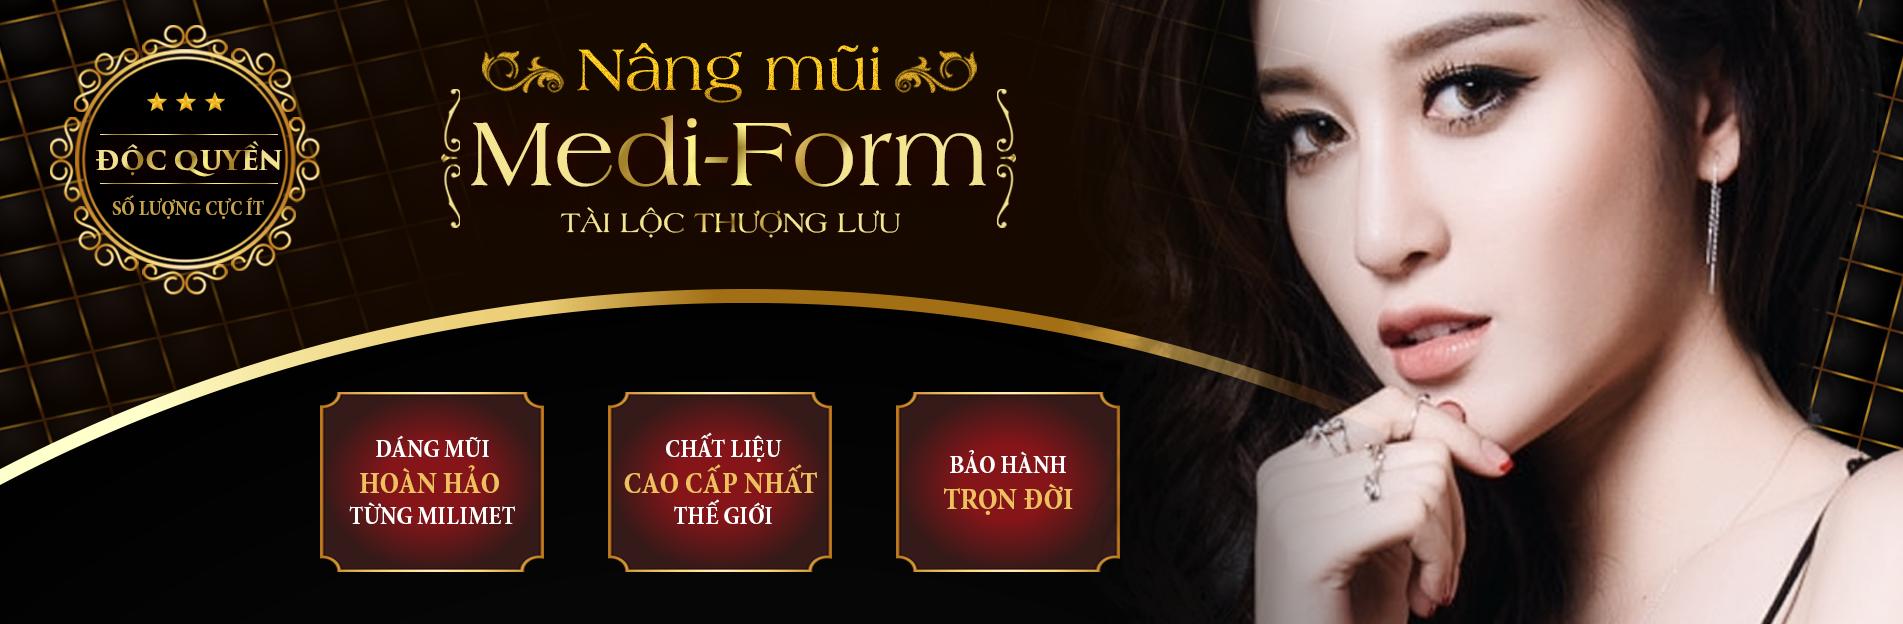 Banner-nang-mui-Medi-Form-28-4